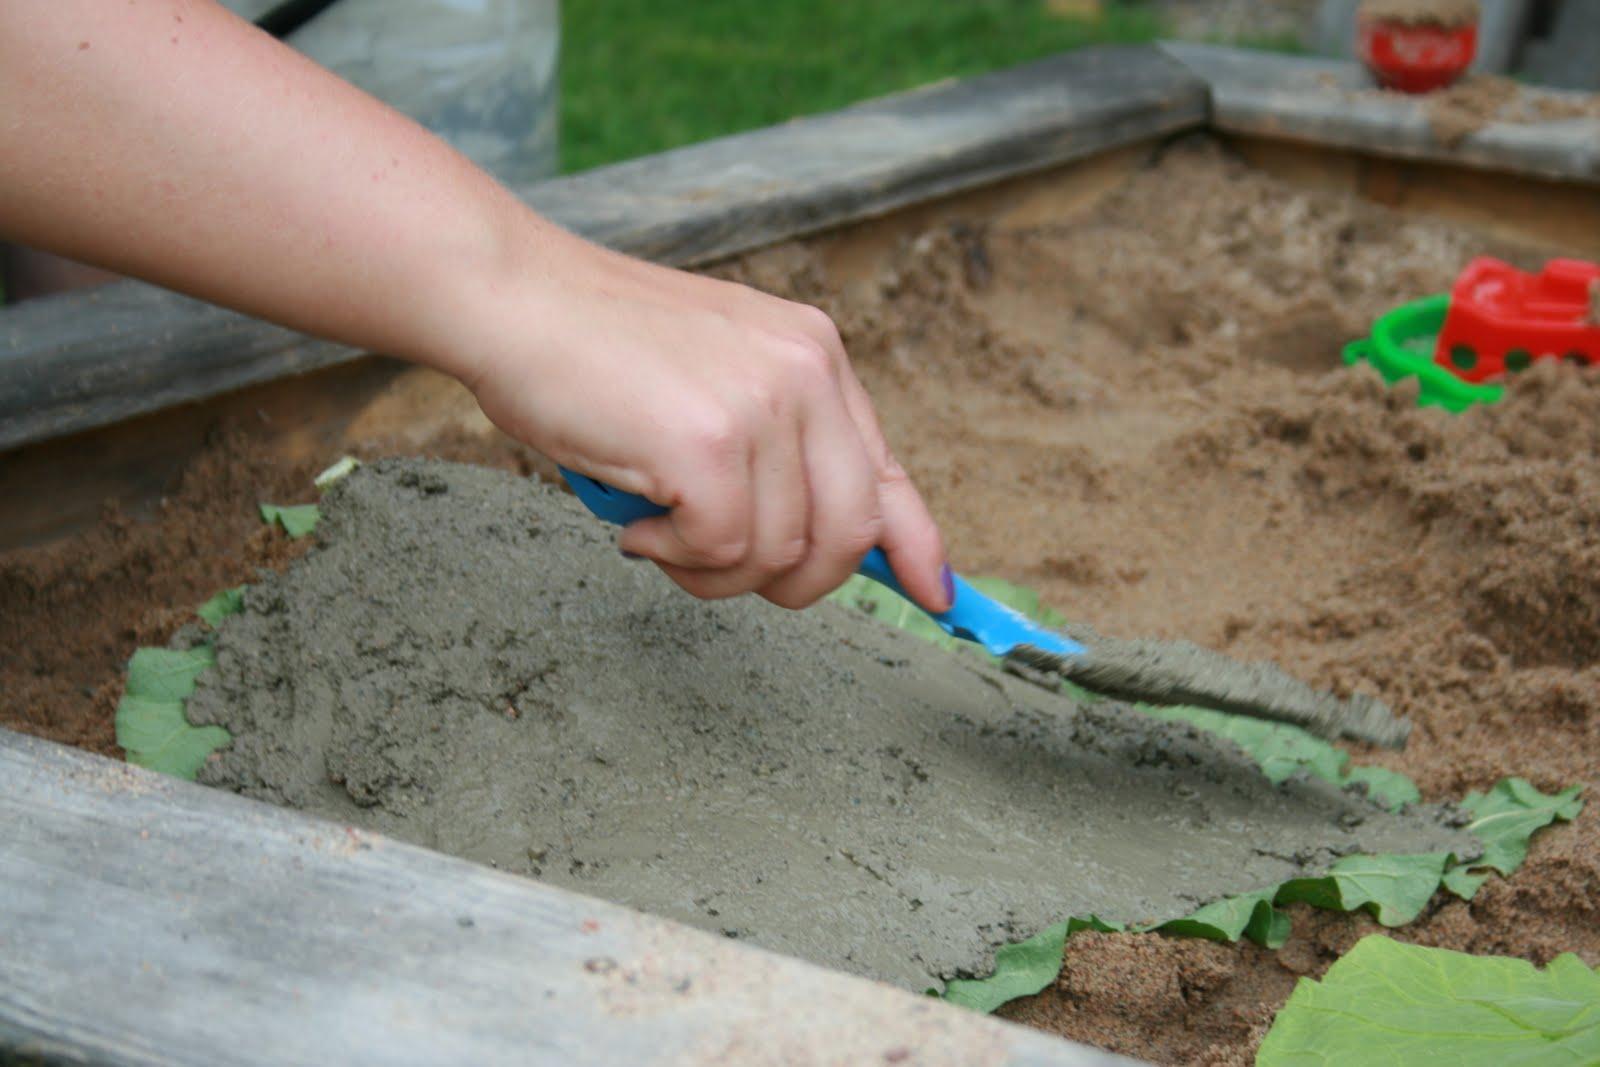 Stories of Saralill: Gjuta betong!